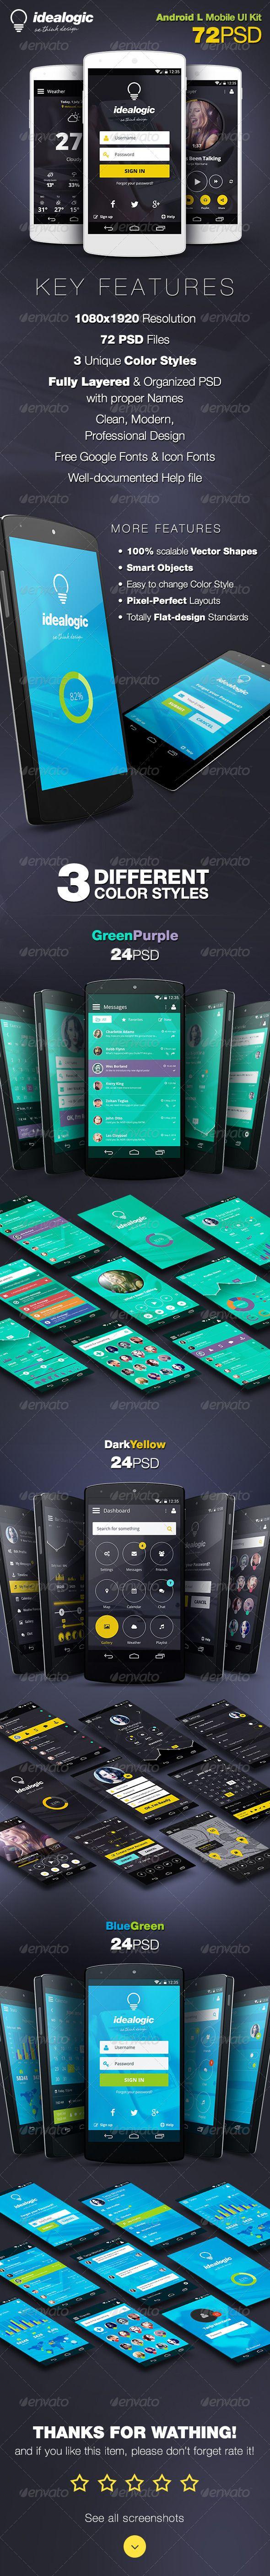 Idealogic - Android L Mobile UI Kit